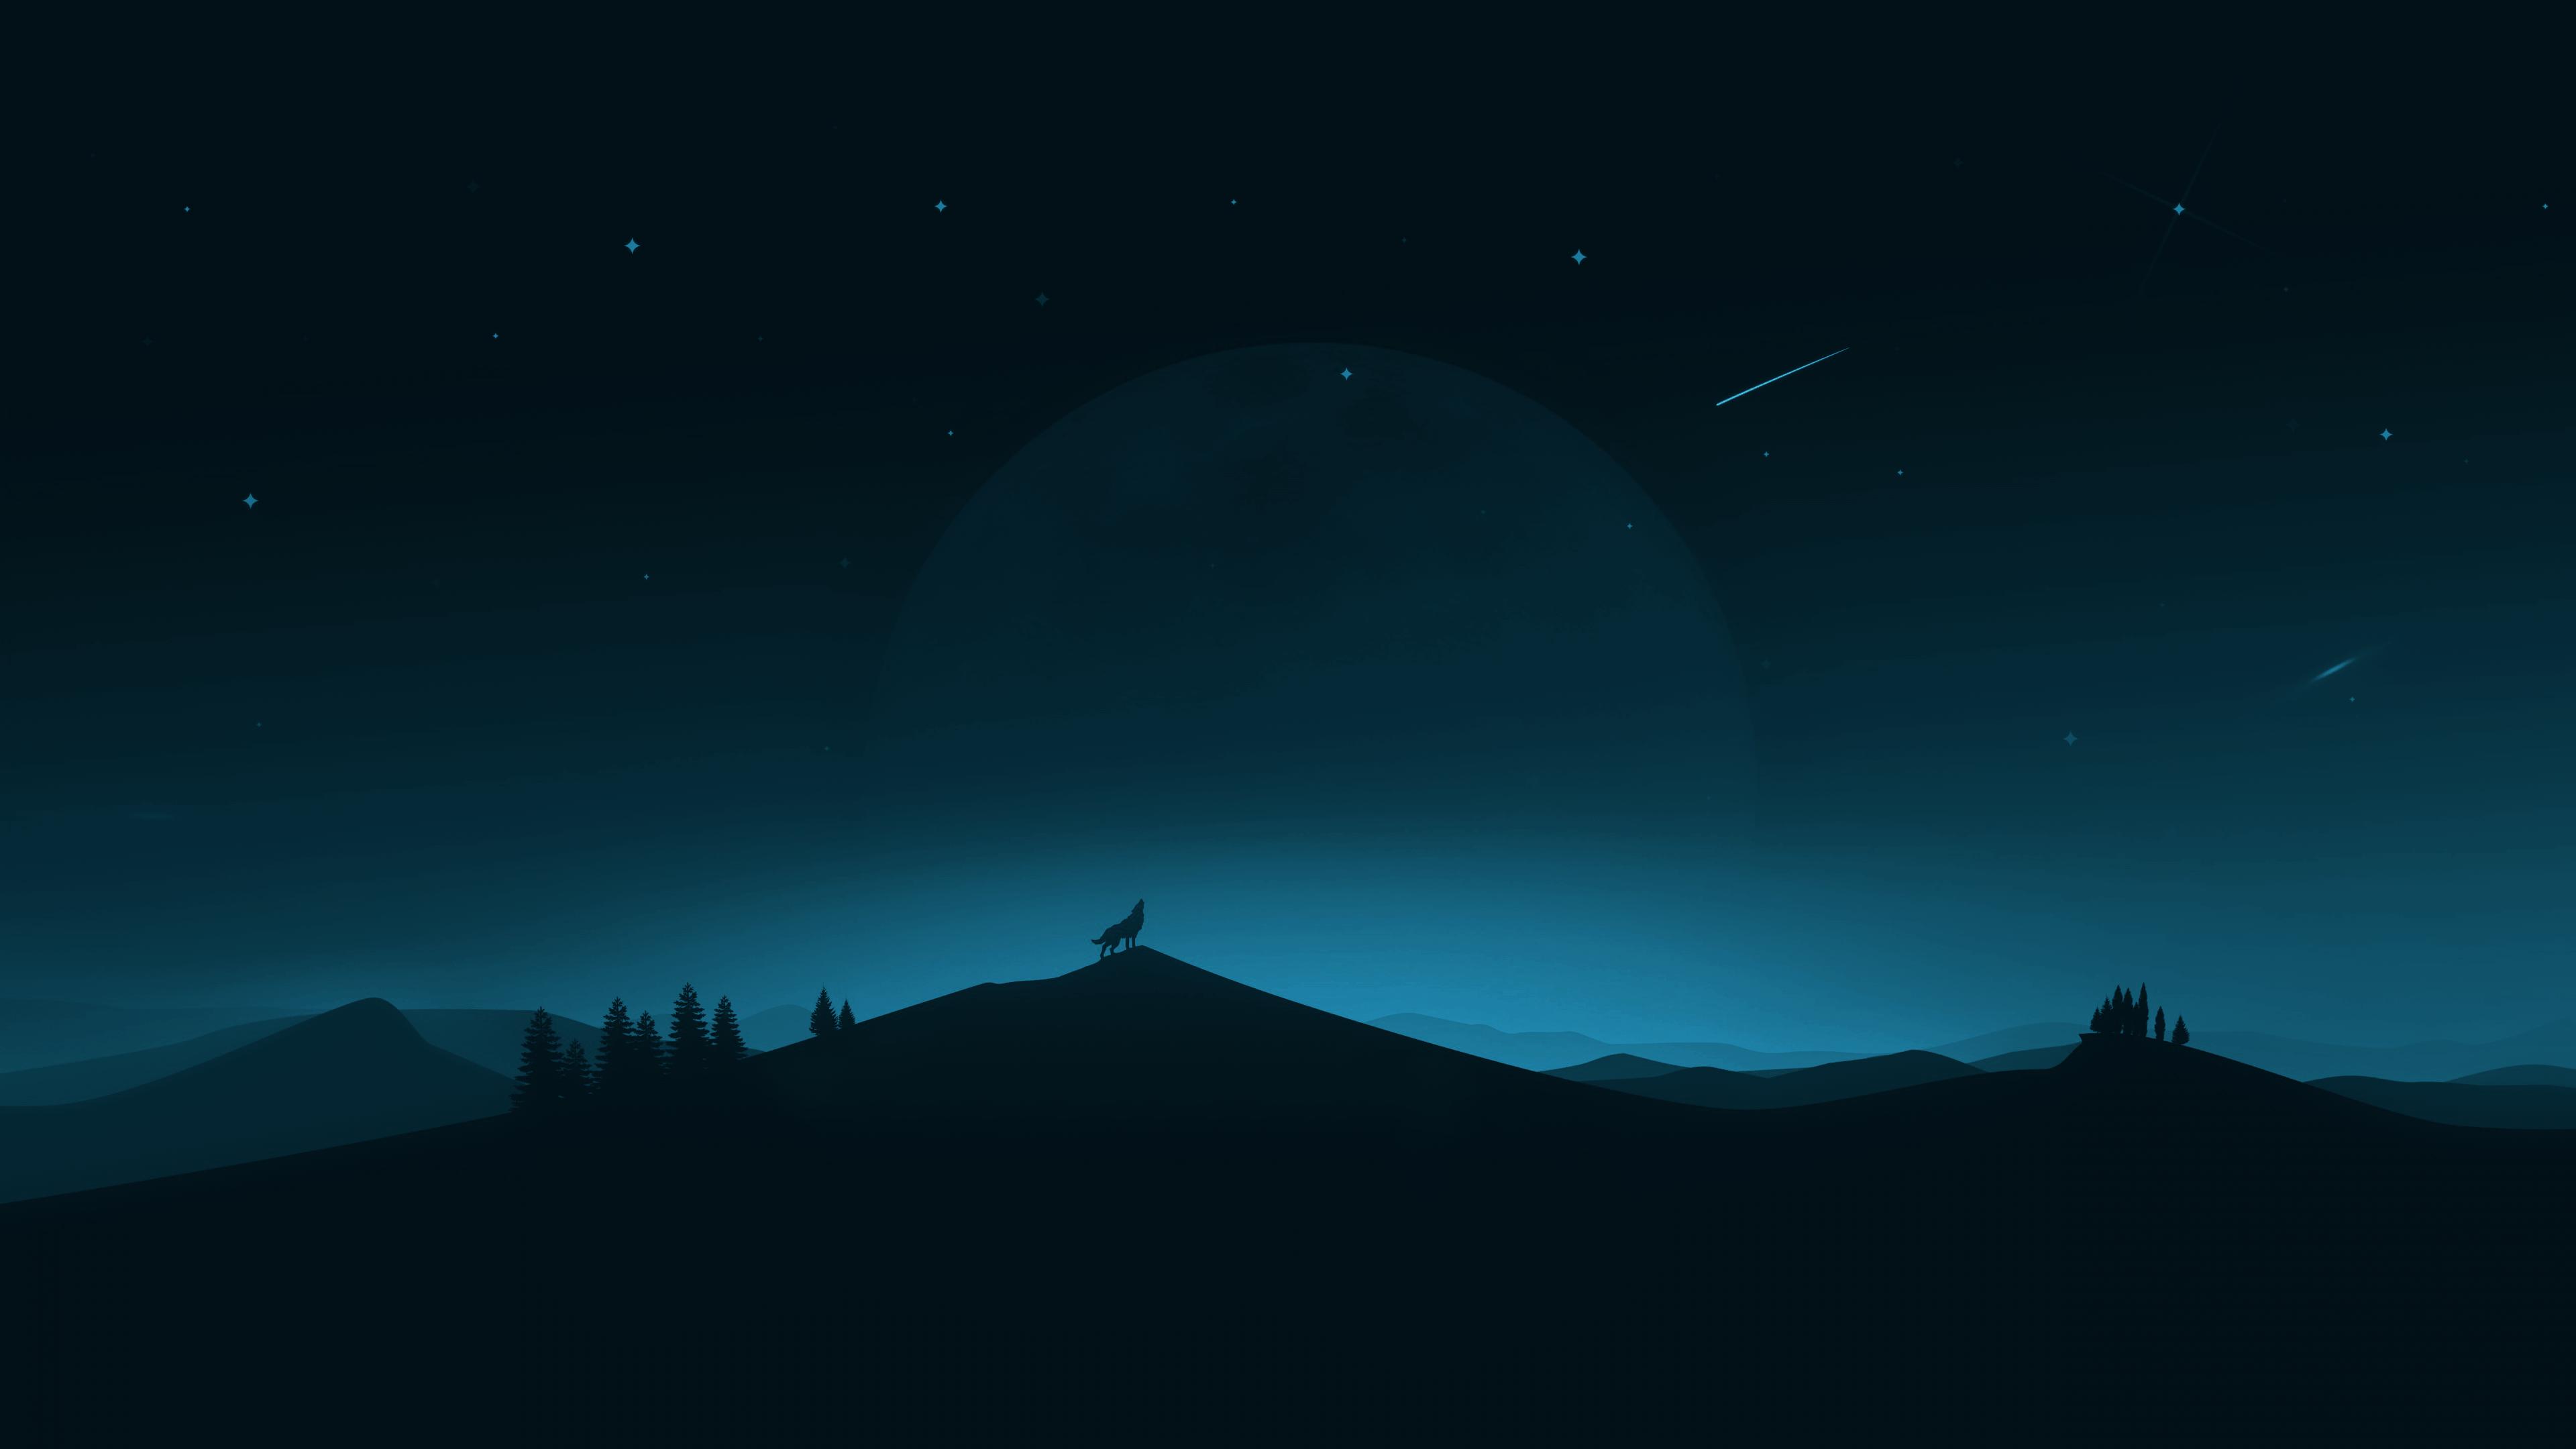 Wallpaper Wolf Digital Art Dark Calm Blue Night Sky